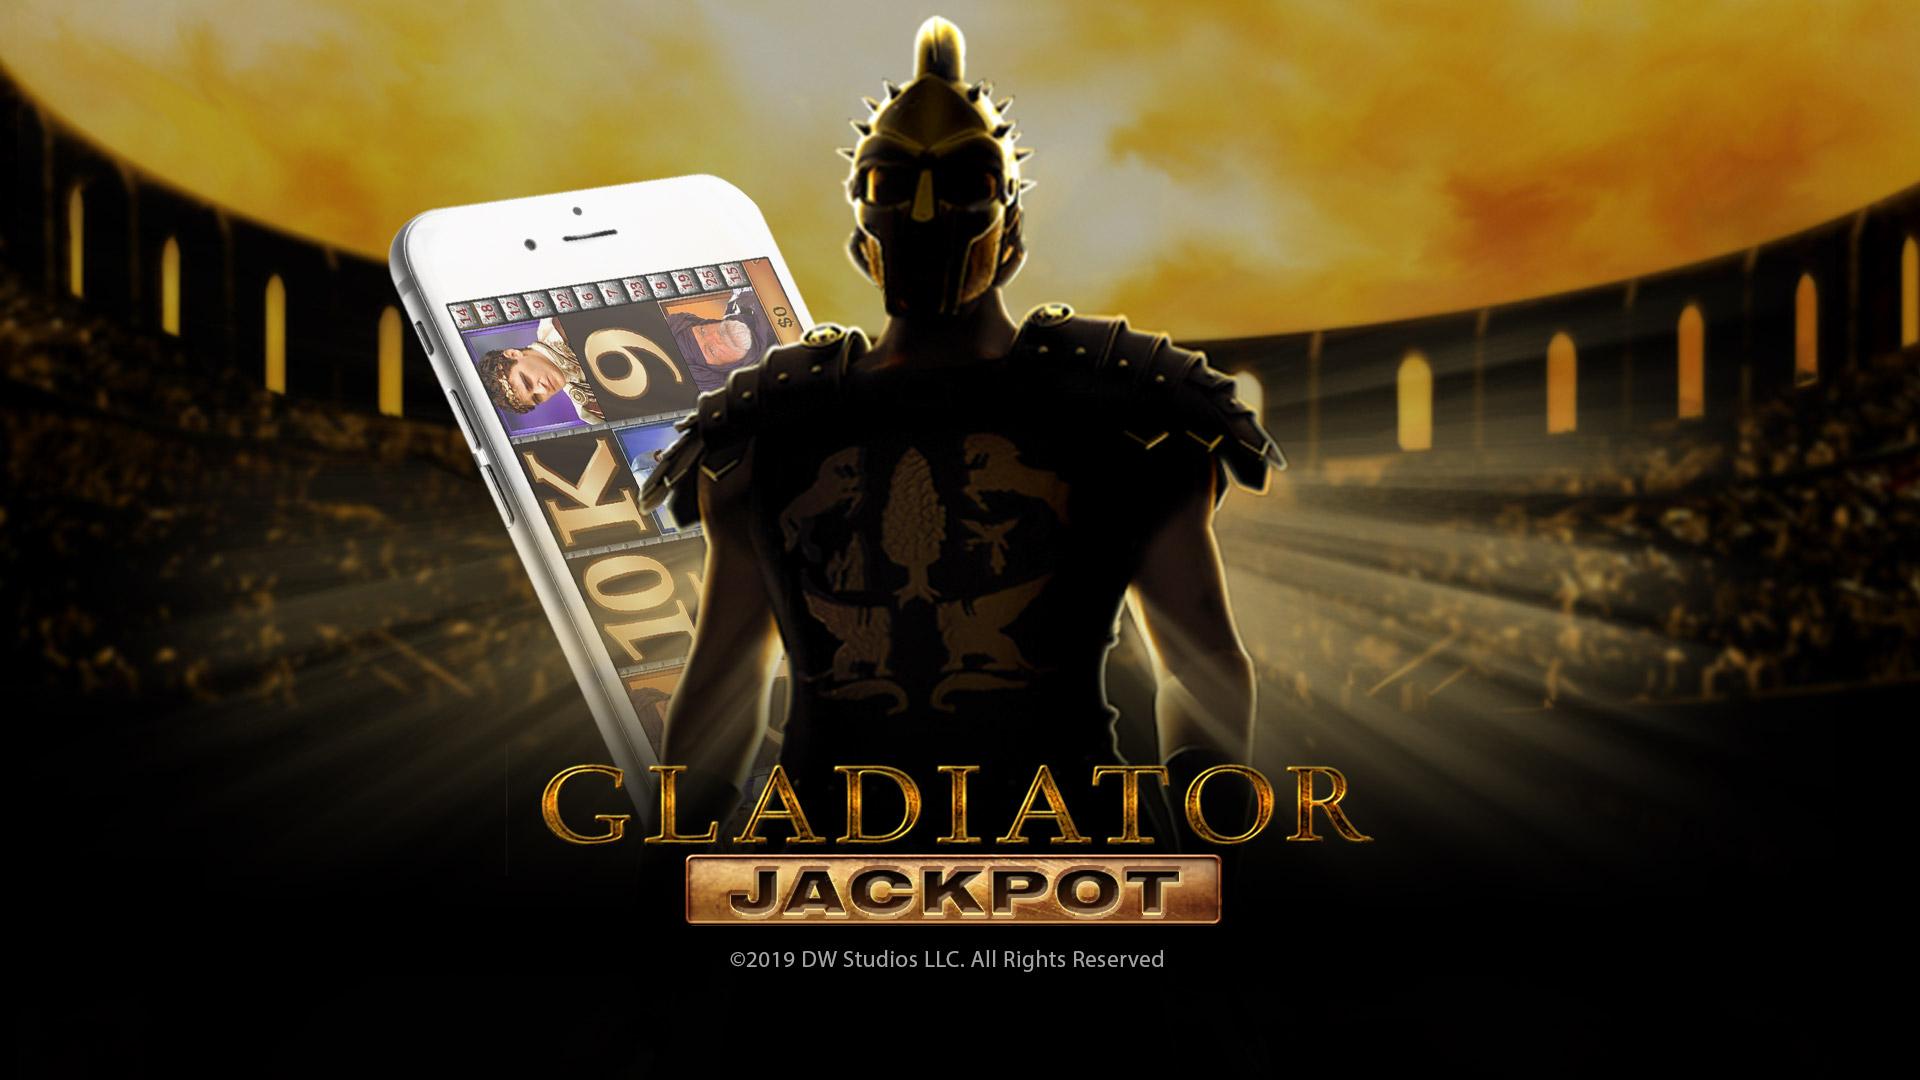 gladiator-jackpot-slot-machine